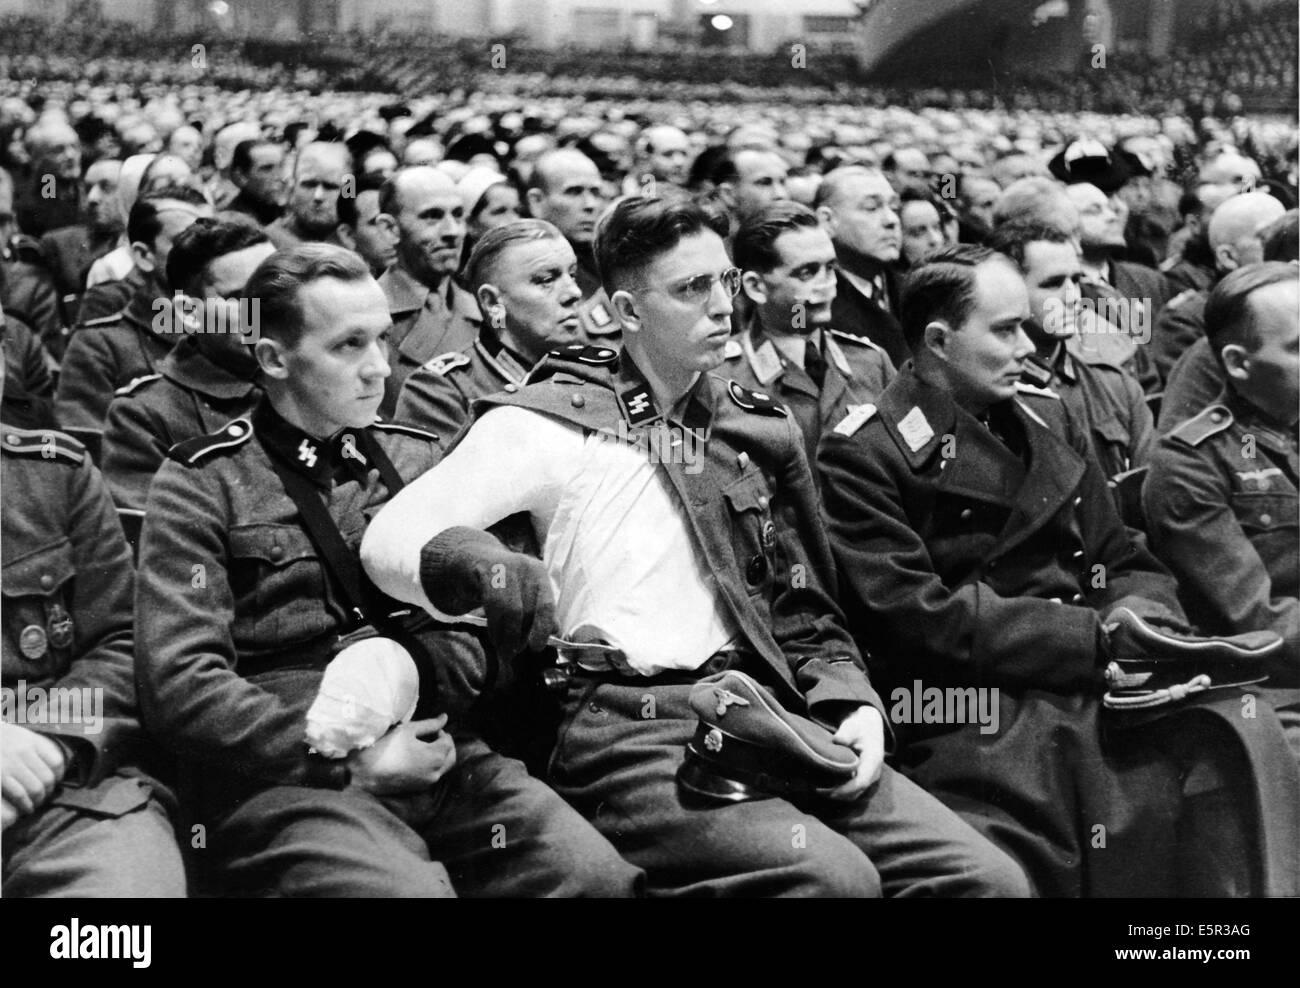 Goebbels Sportpalastrede Text